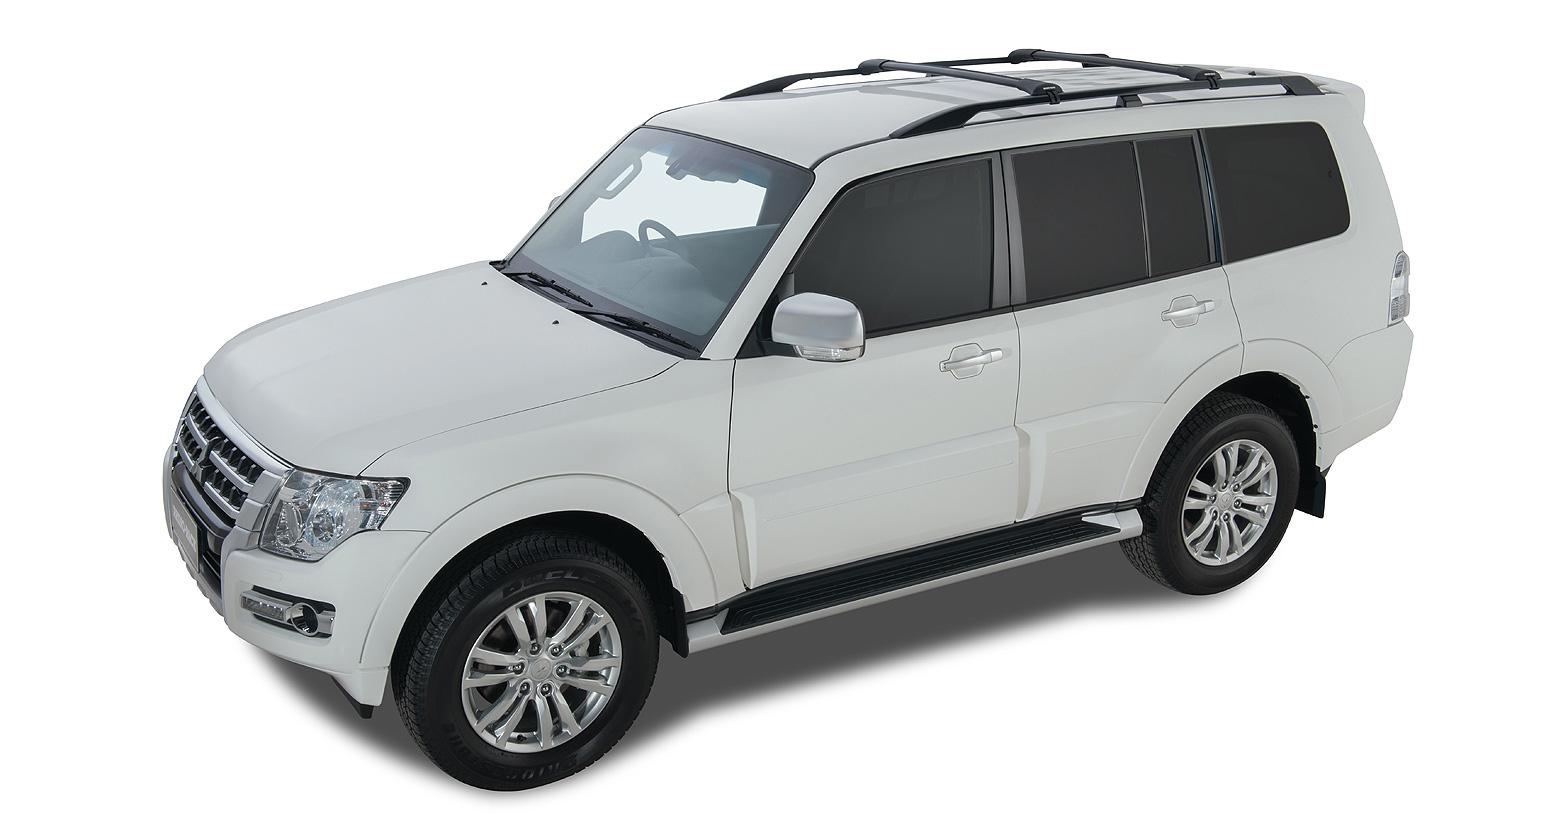 Rhino Roof Rack Stealth Bar Stealthbar For Mitsubishi